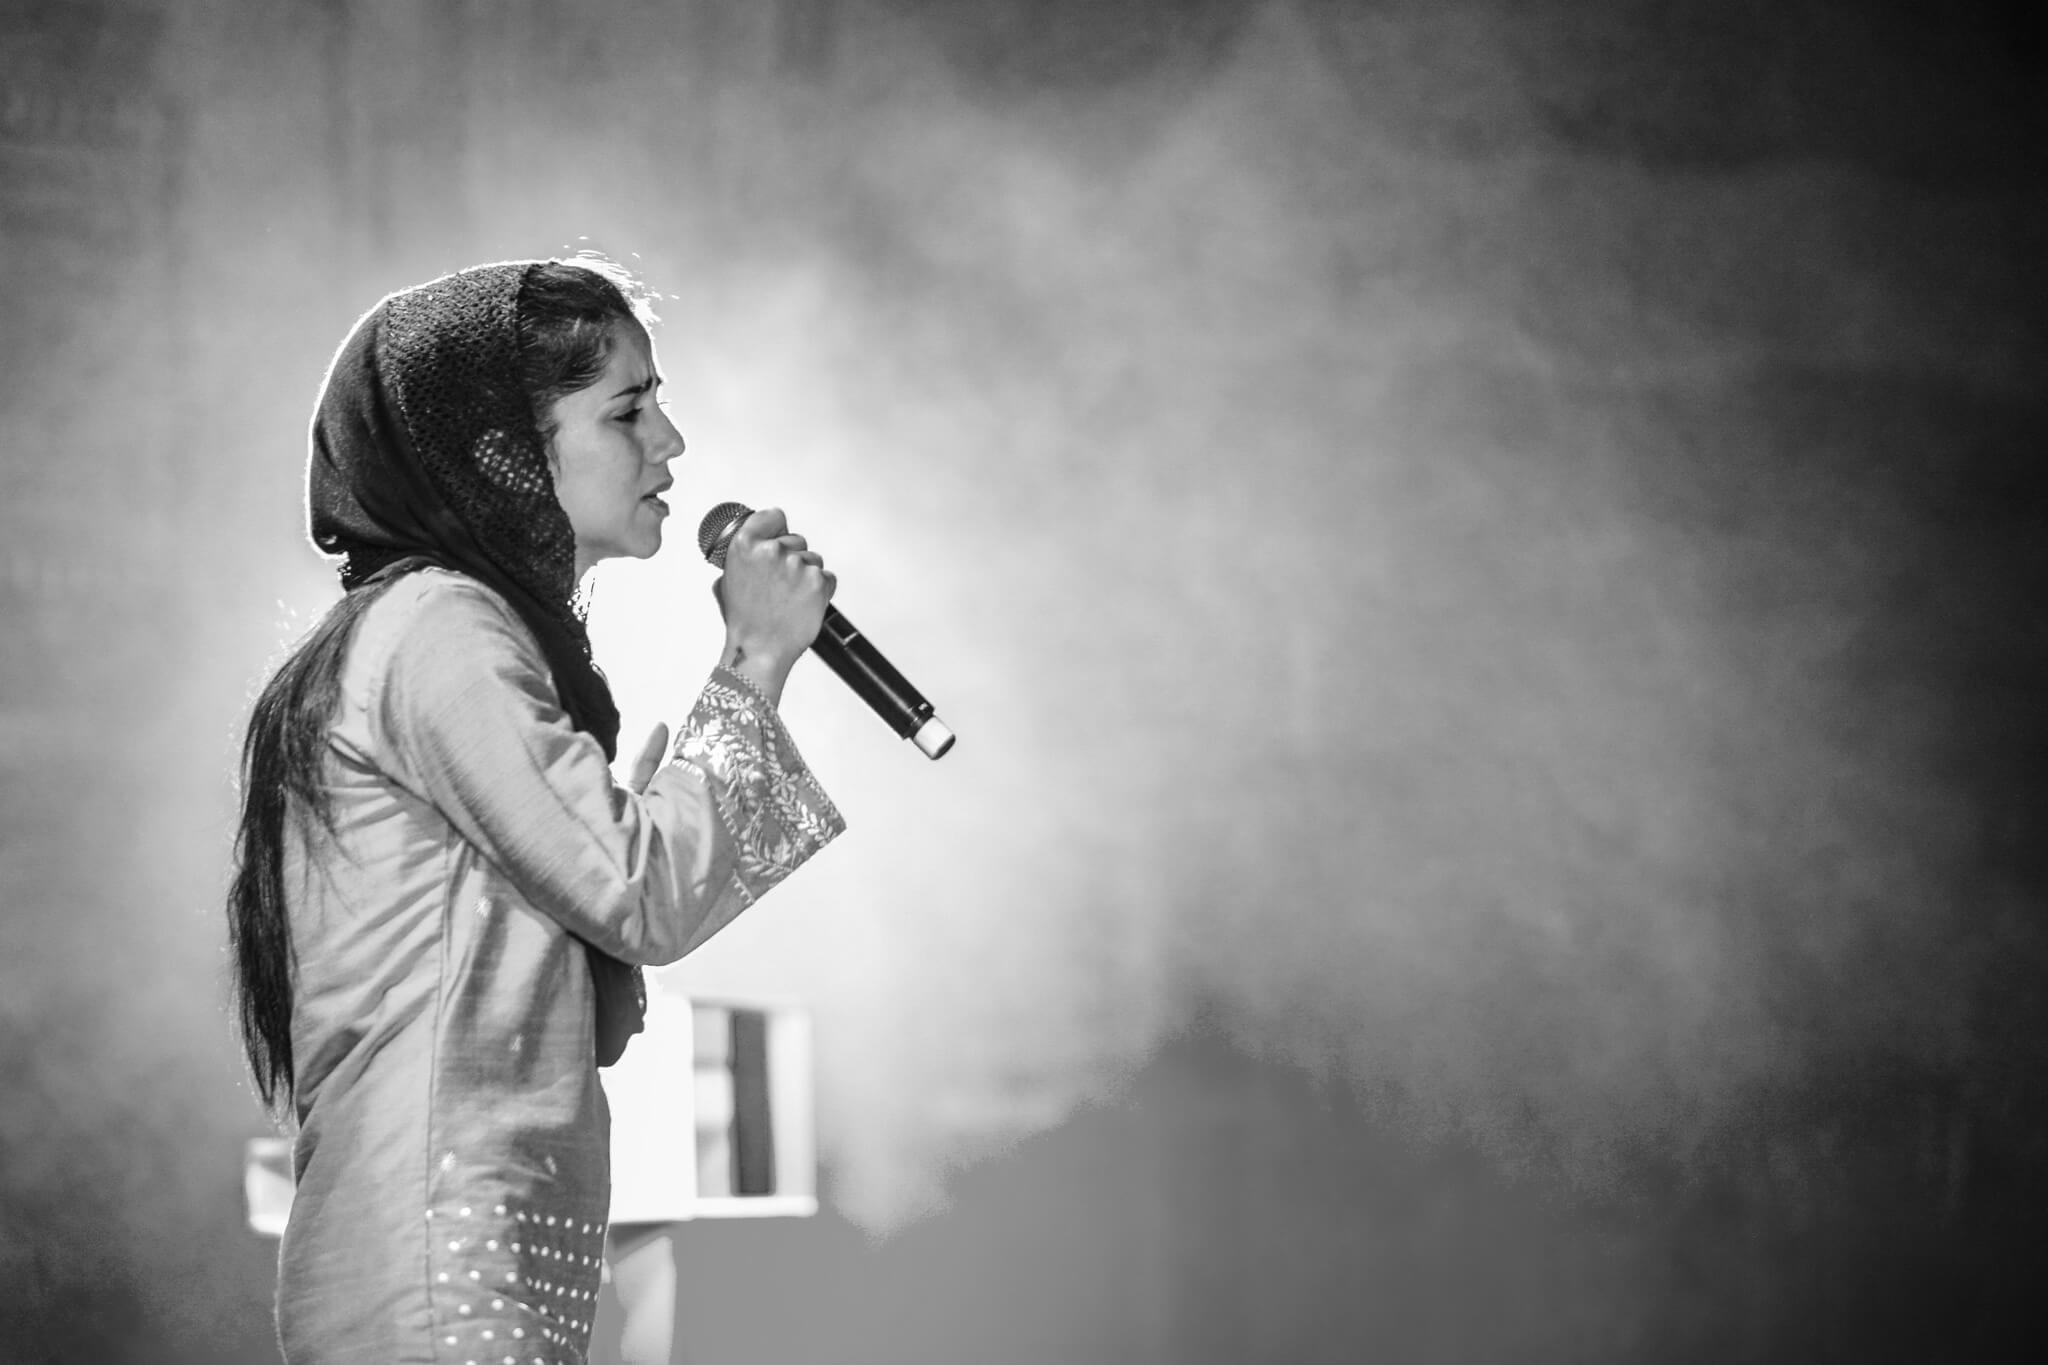 performance-sonitabw